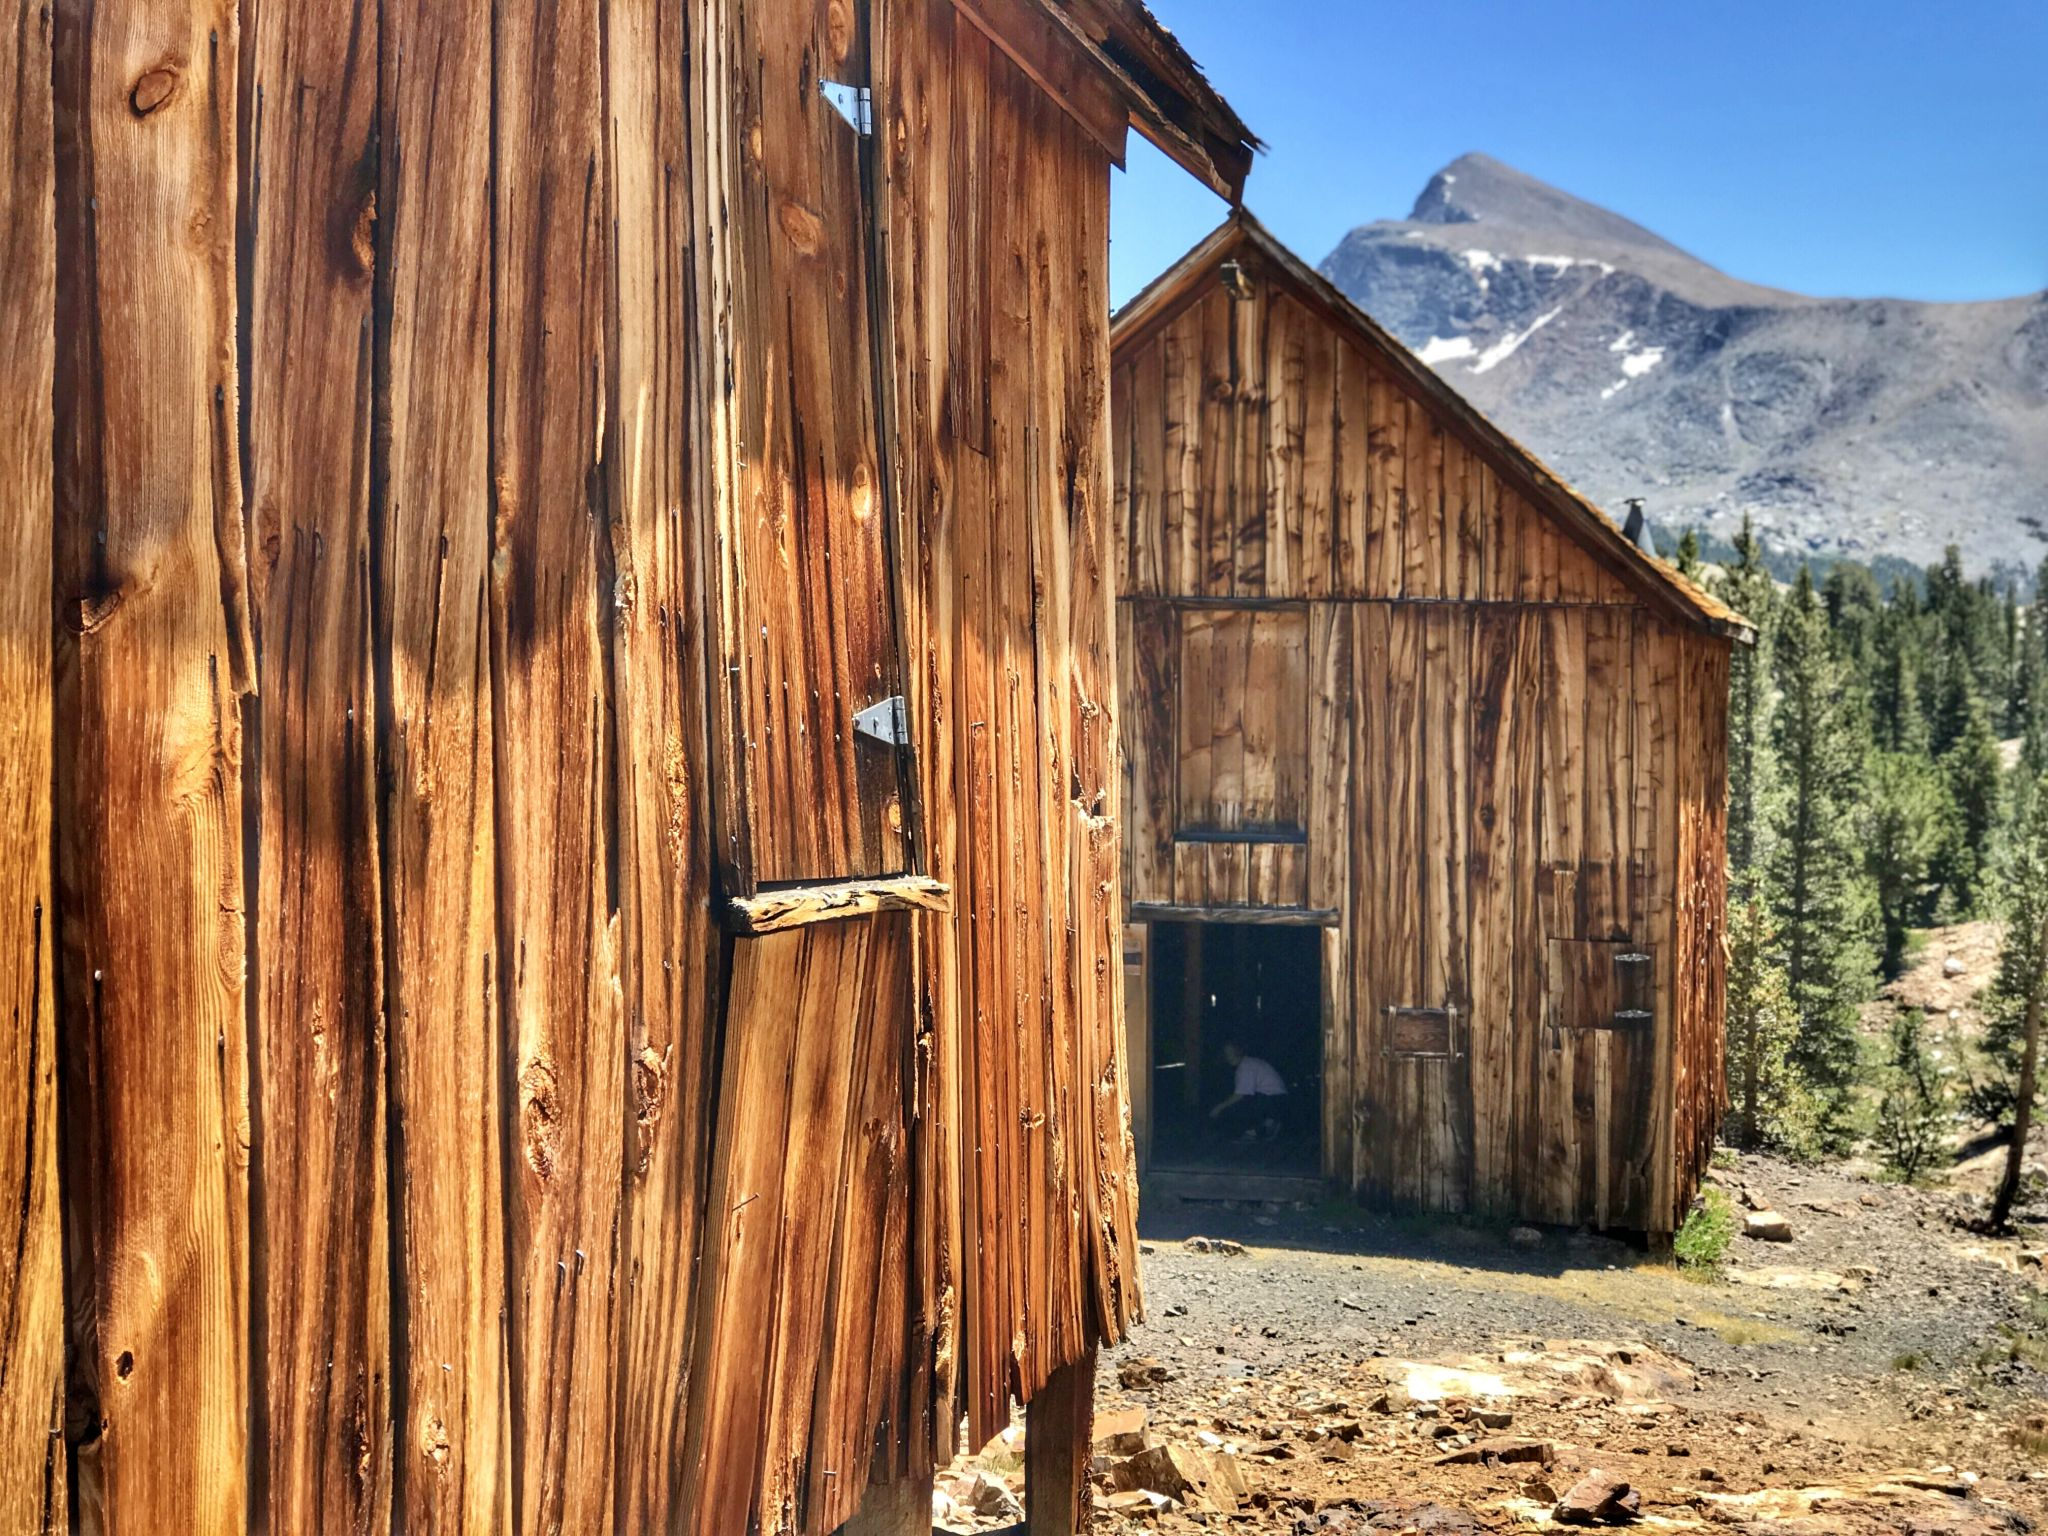 Bennettville mining town, Tioga Pass, CA, USA